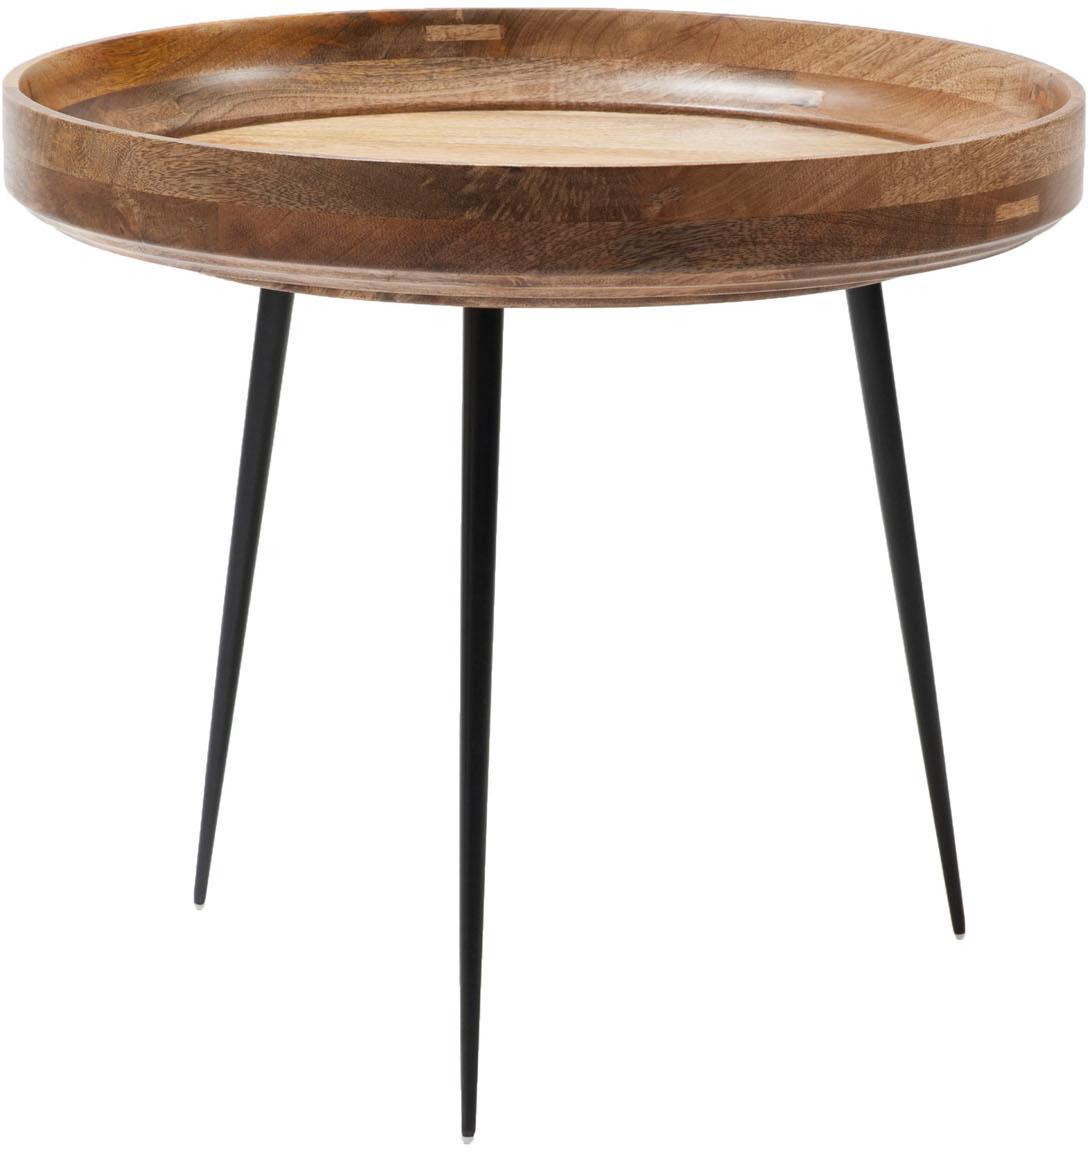 Kleiner Design-Beistelltisch Bowl Table aus Mangoholz, Tischplatte: Mangoholz, klarlackiert, Beine: Stahl, pulverbeschichtet, Mangoholz, Schwarz, Ø 53 x H 46 cm